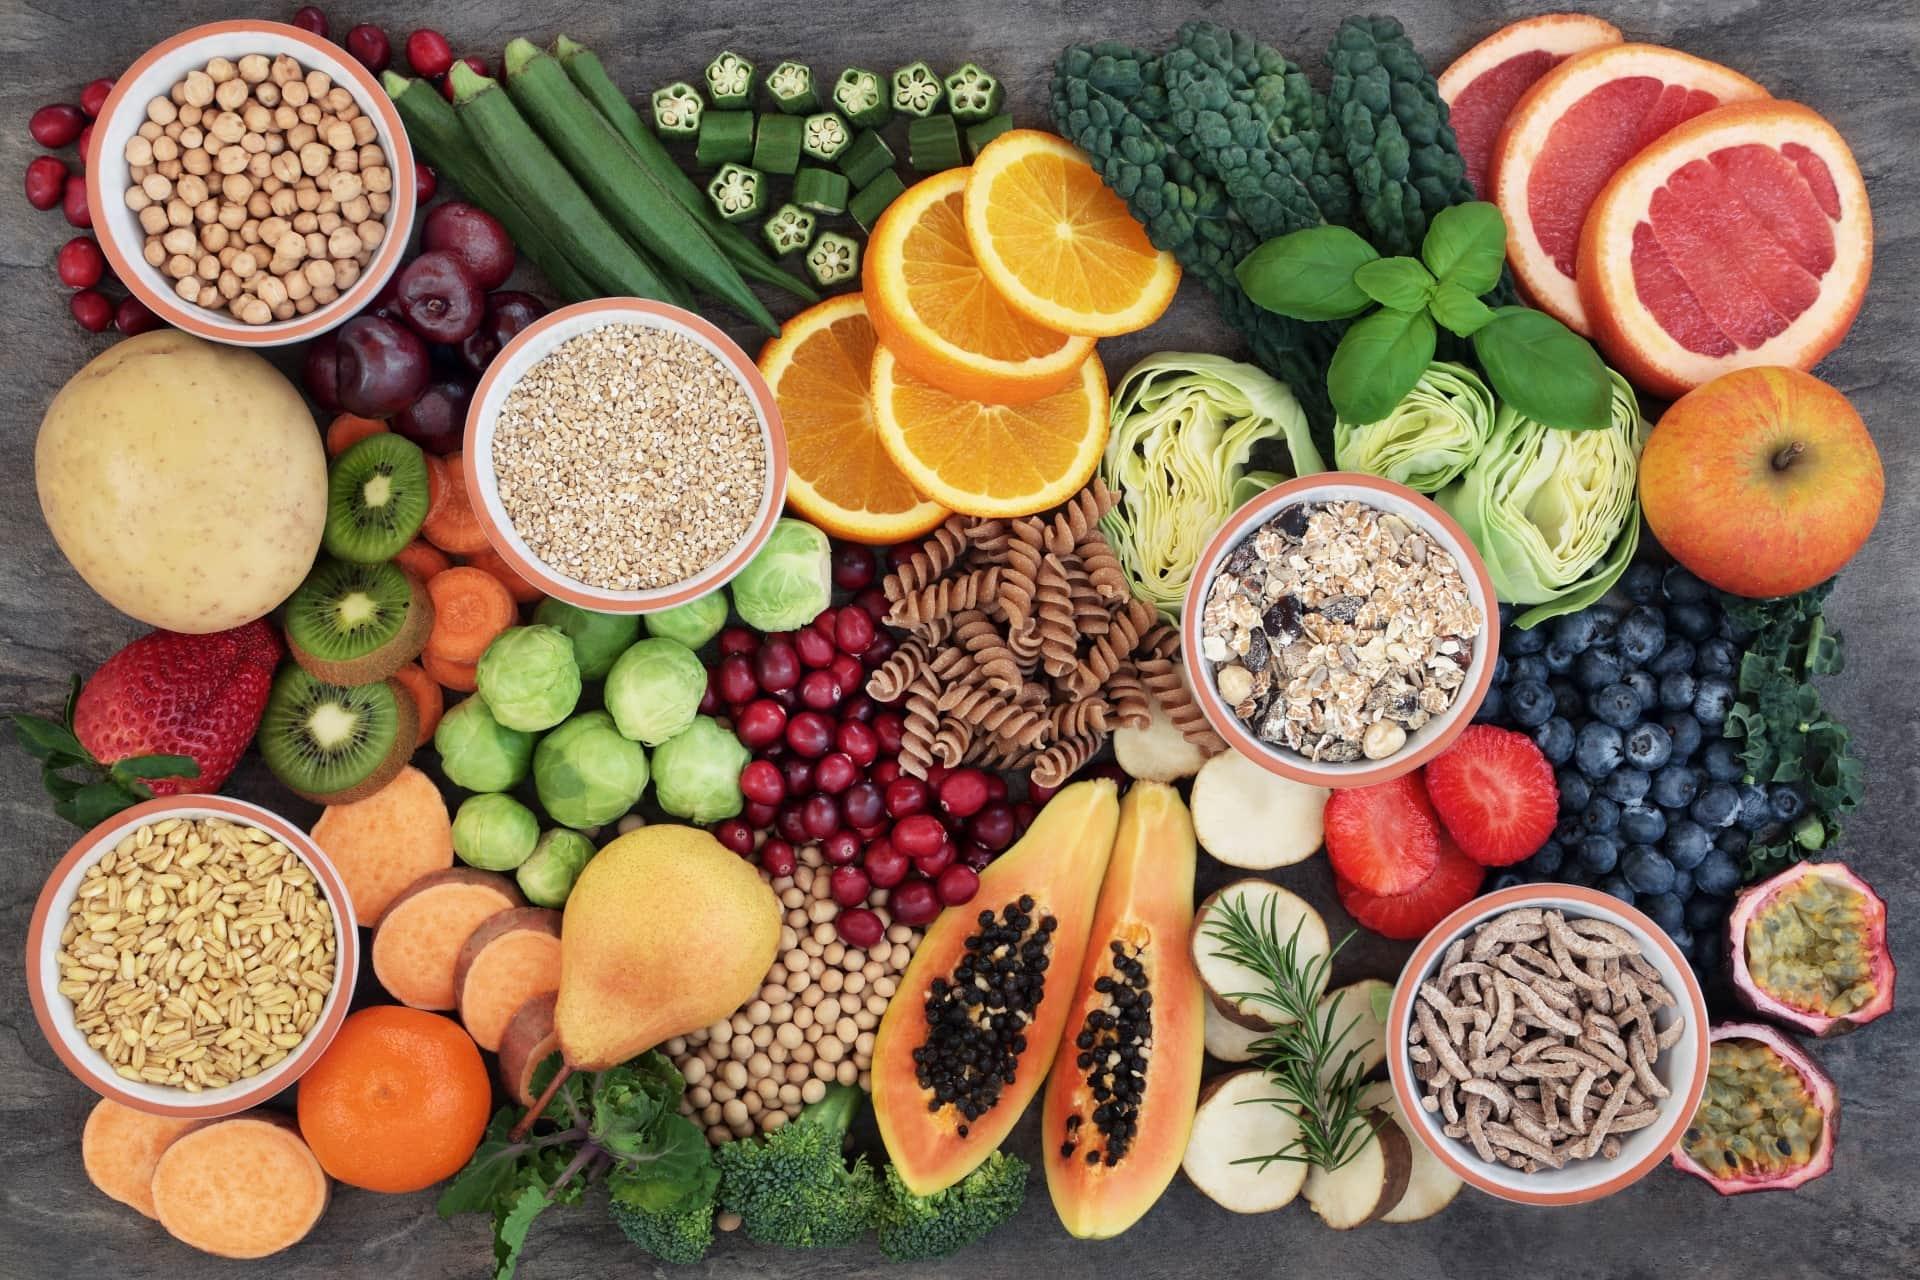 Ешьте богатую клетчаткой пищу – кишечник и мозг будут благодарны